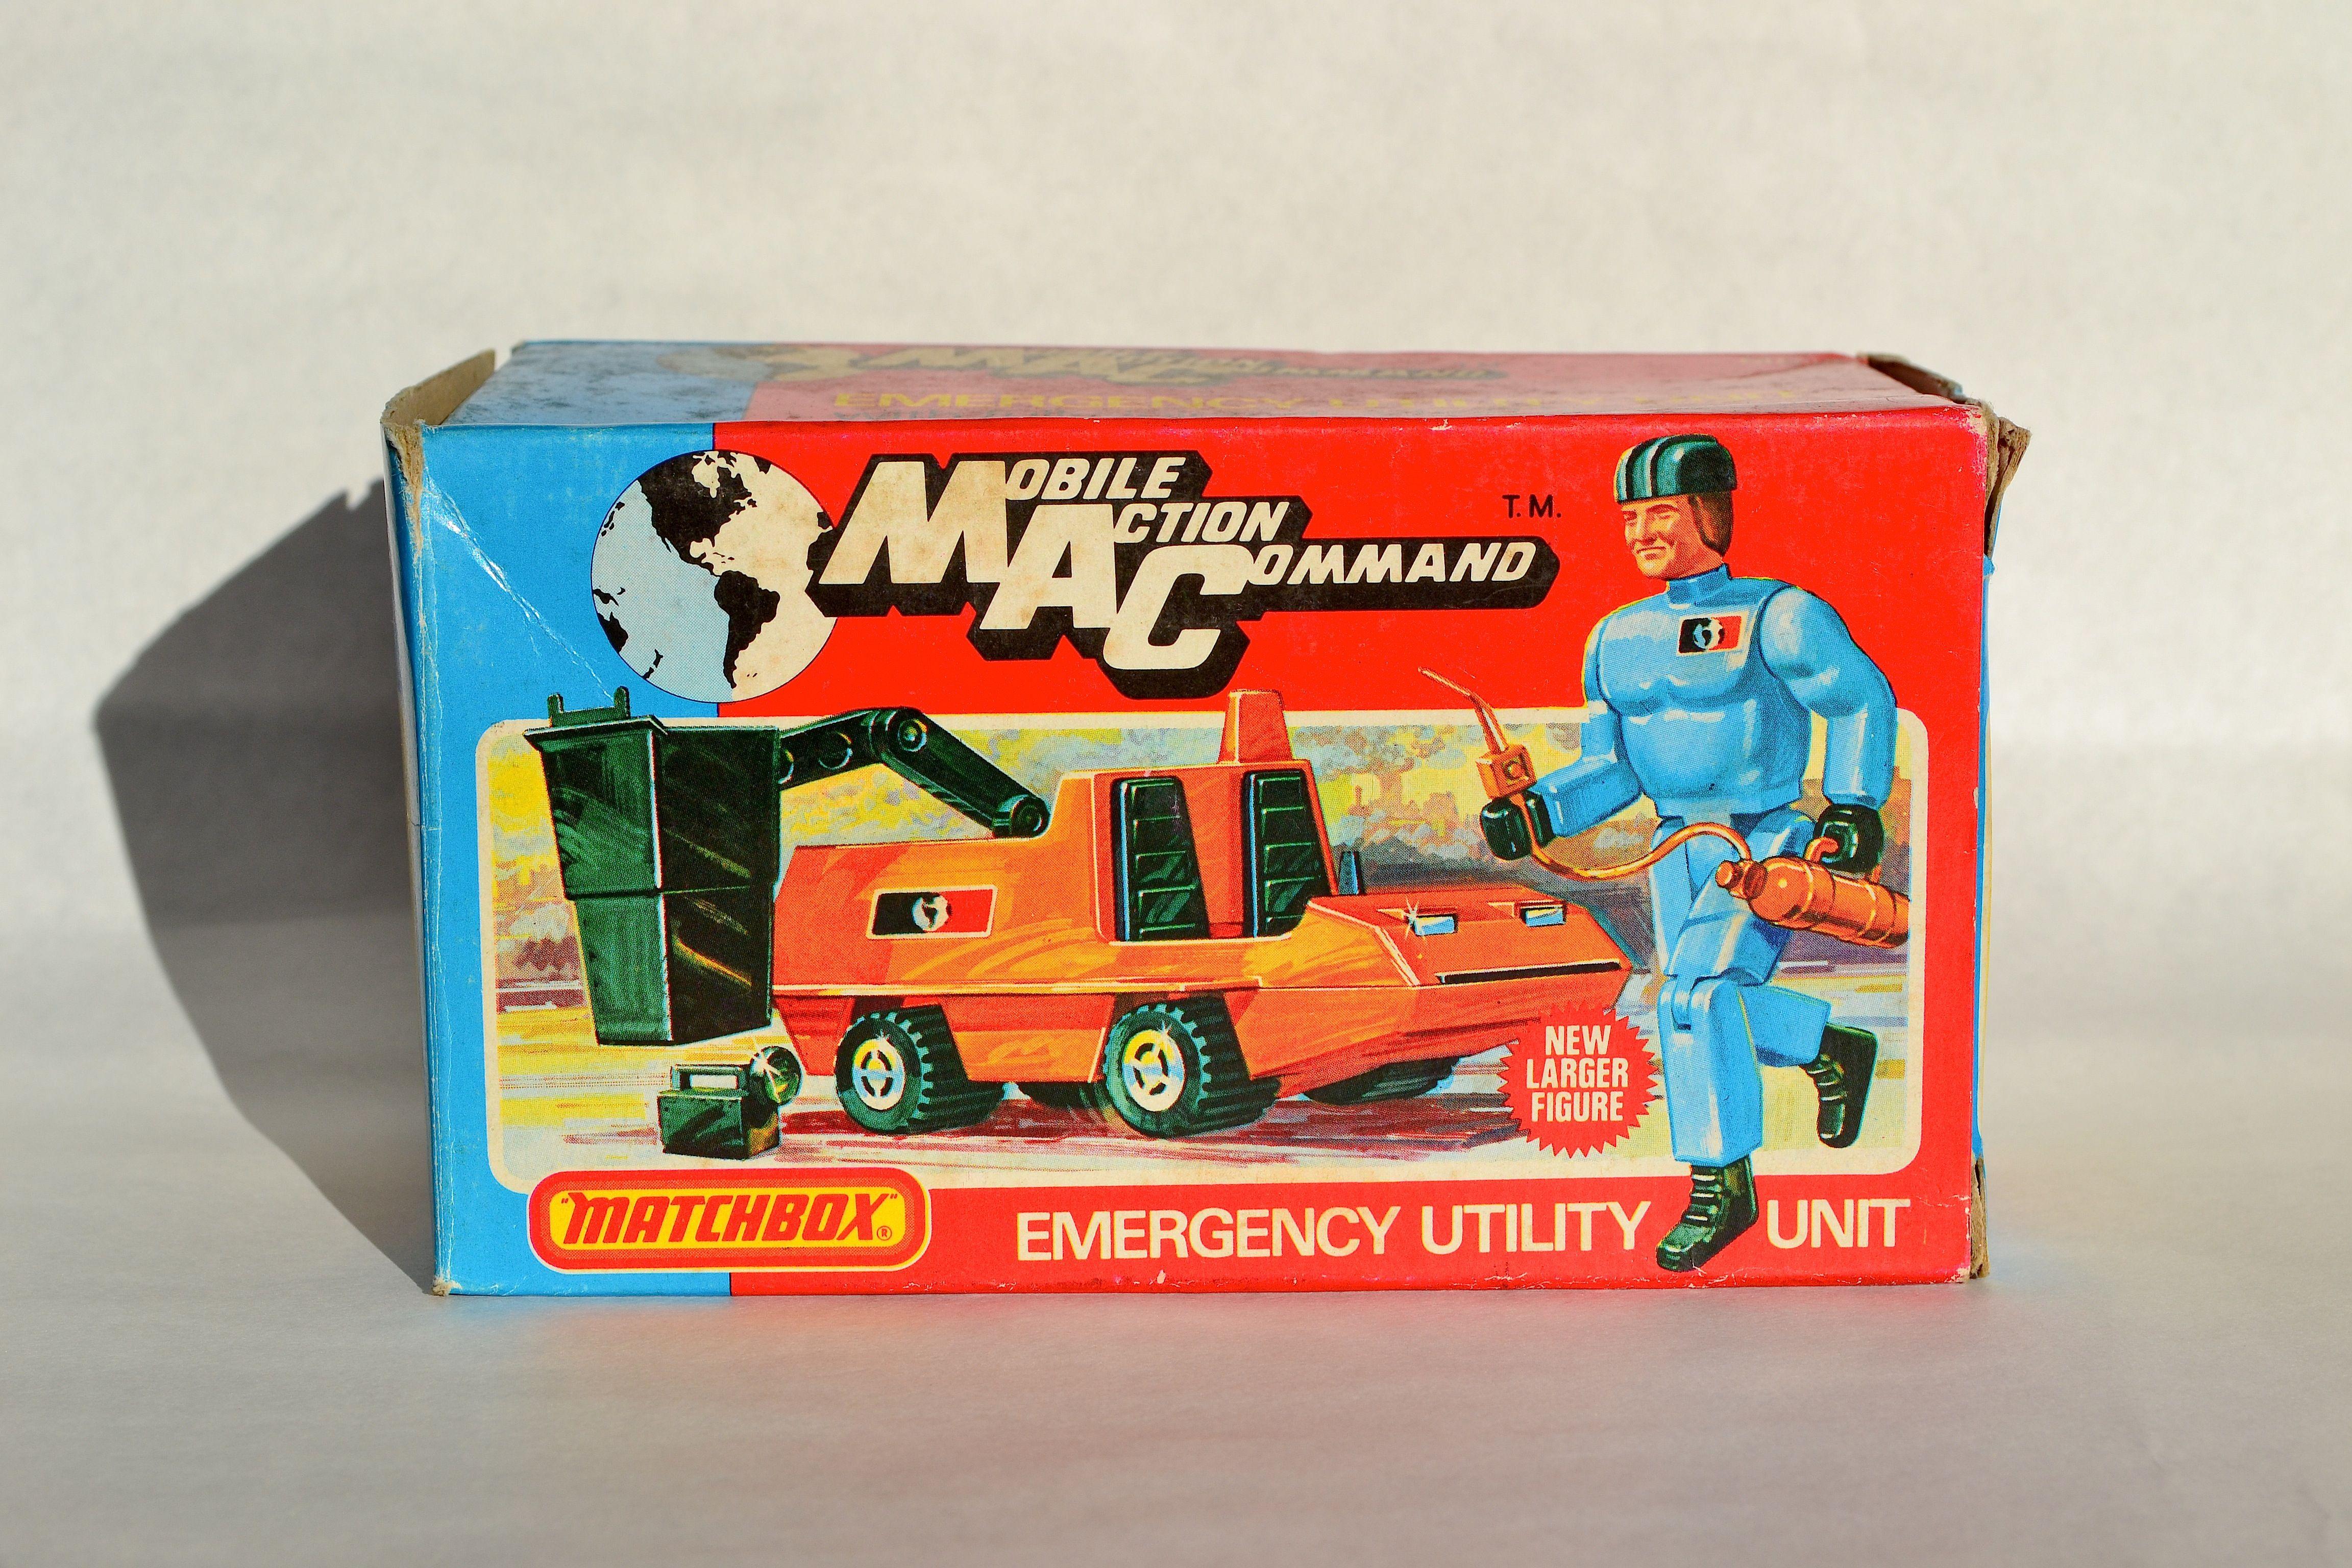 Mcs mobili ~ Matchbox mobile action command. mc 3 emergency utility unit. $420